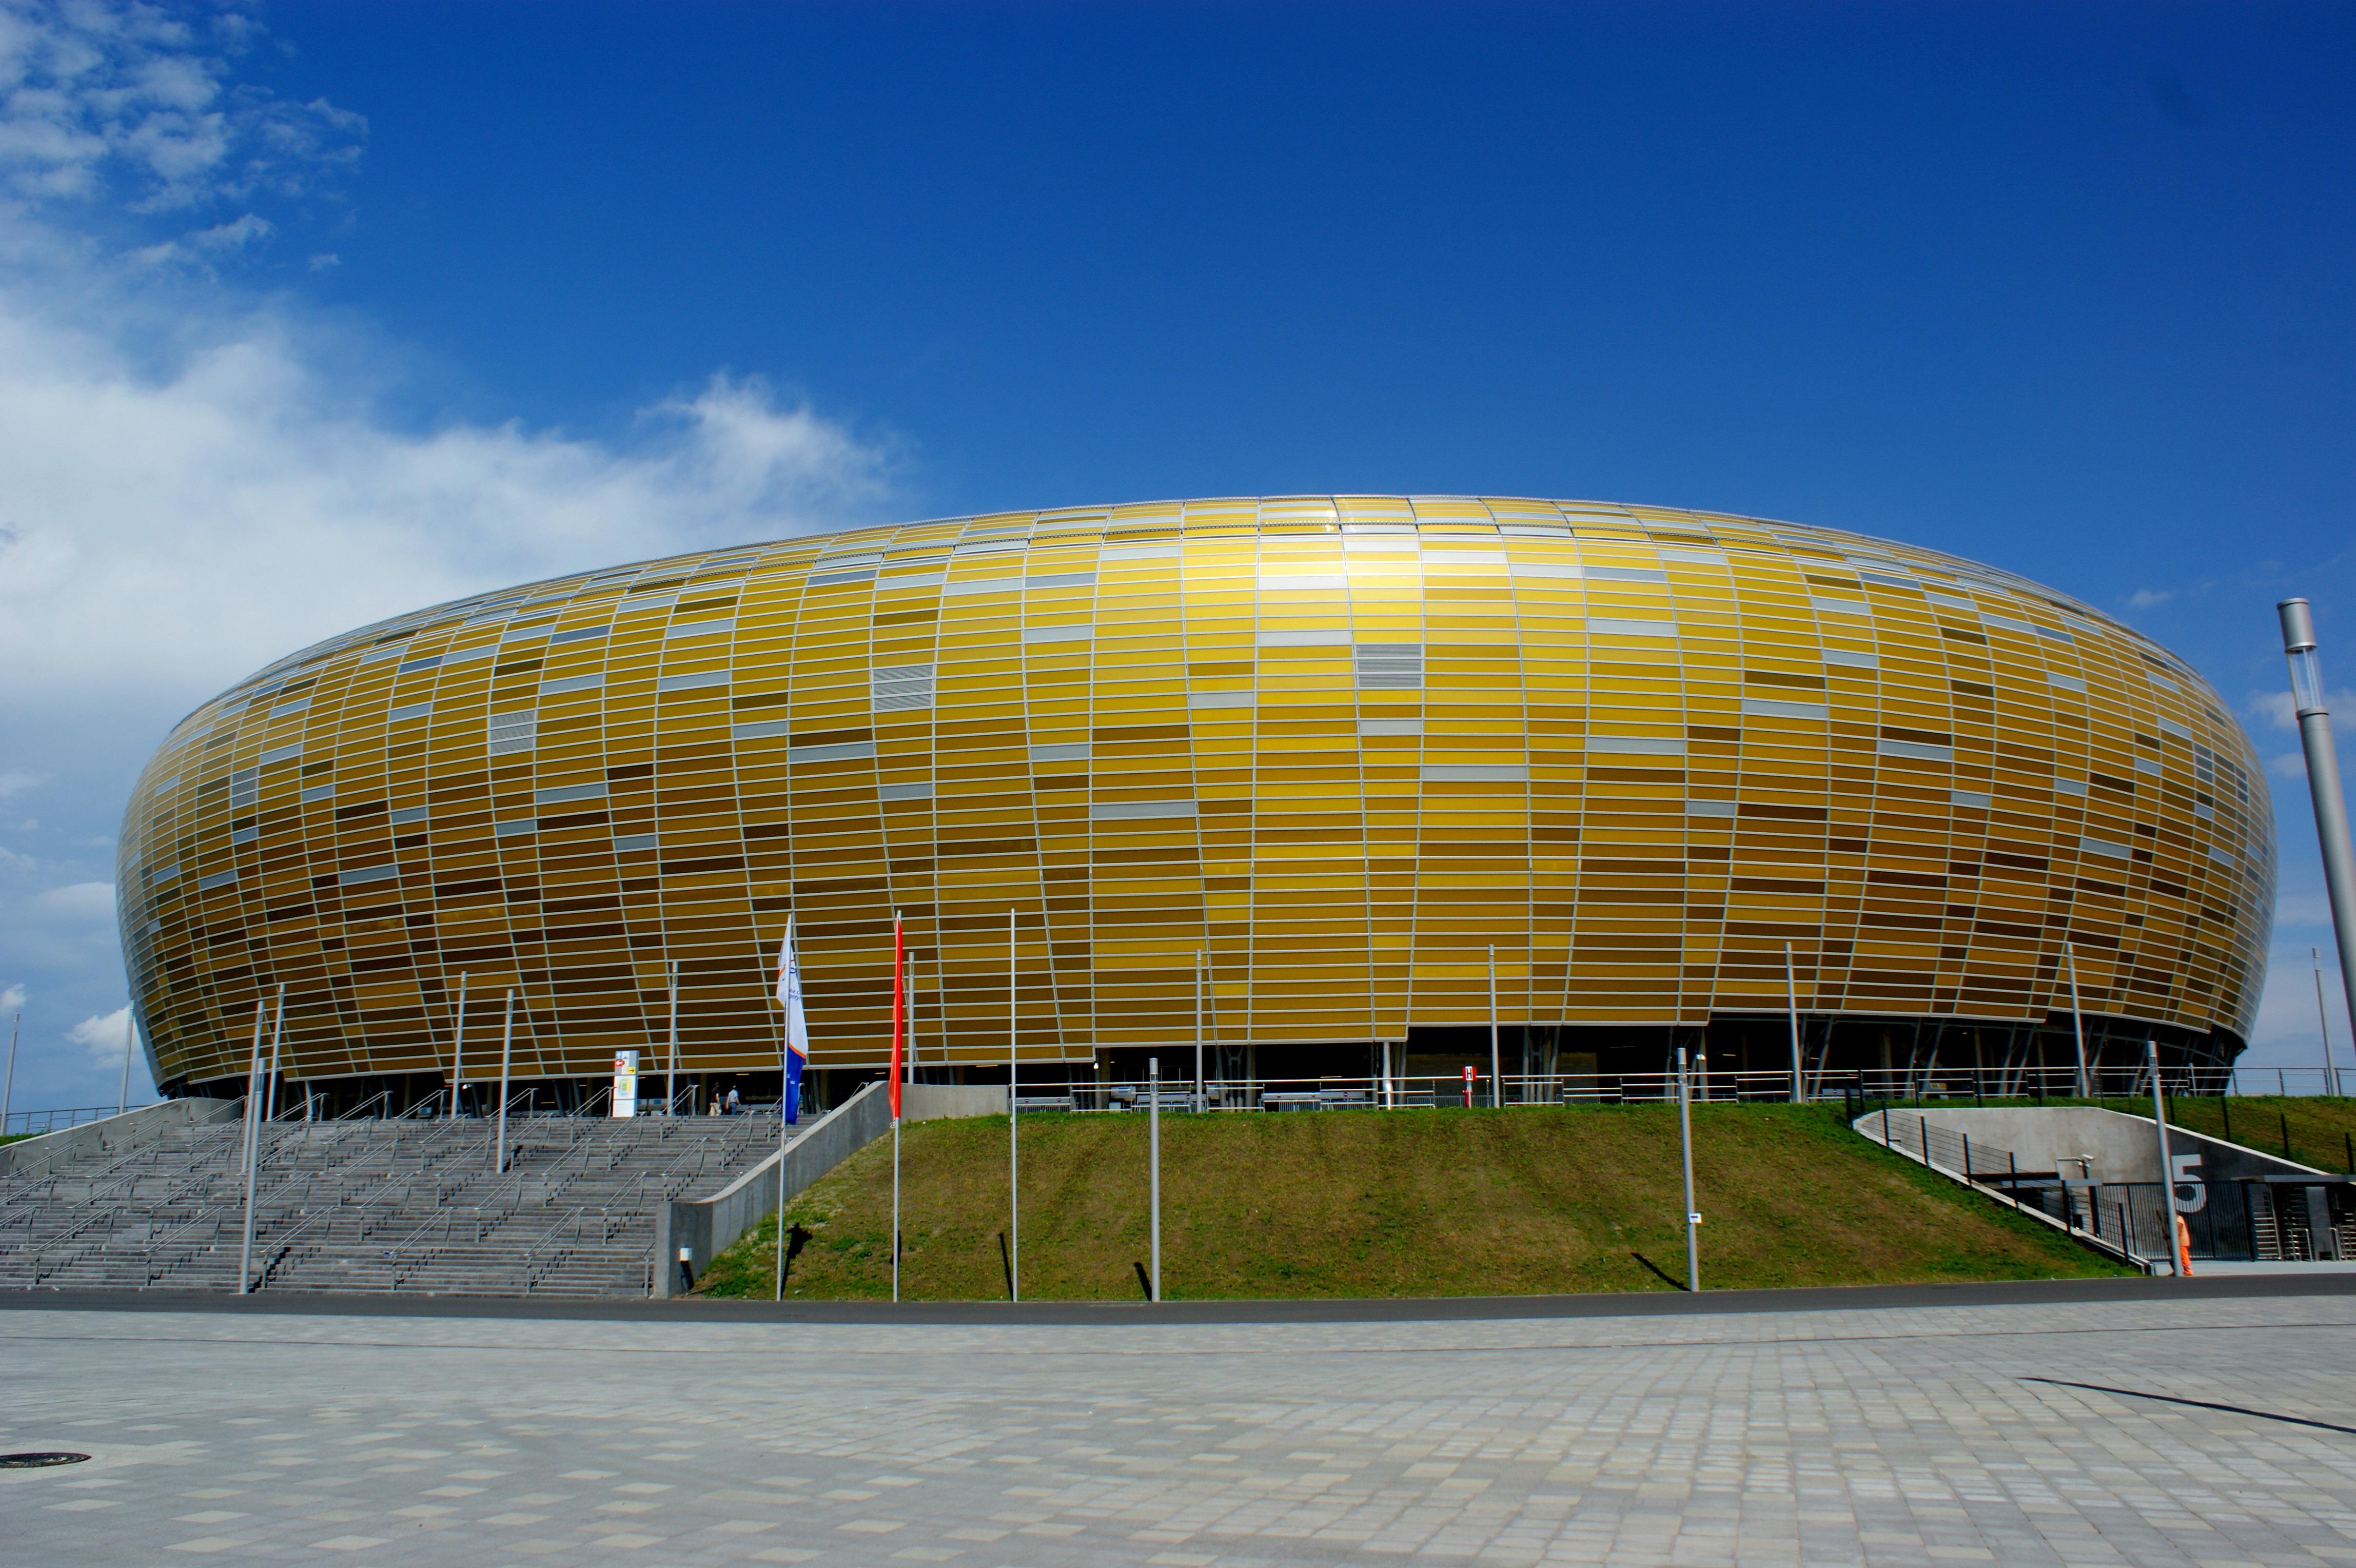 https://upload.wikimedia.org/wikipedia/commons/1/1b/PGE_Arena_outside.jpg